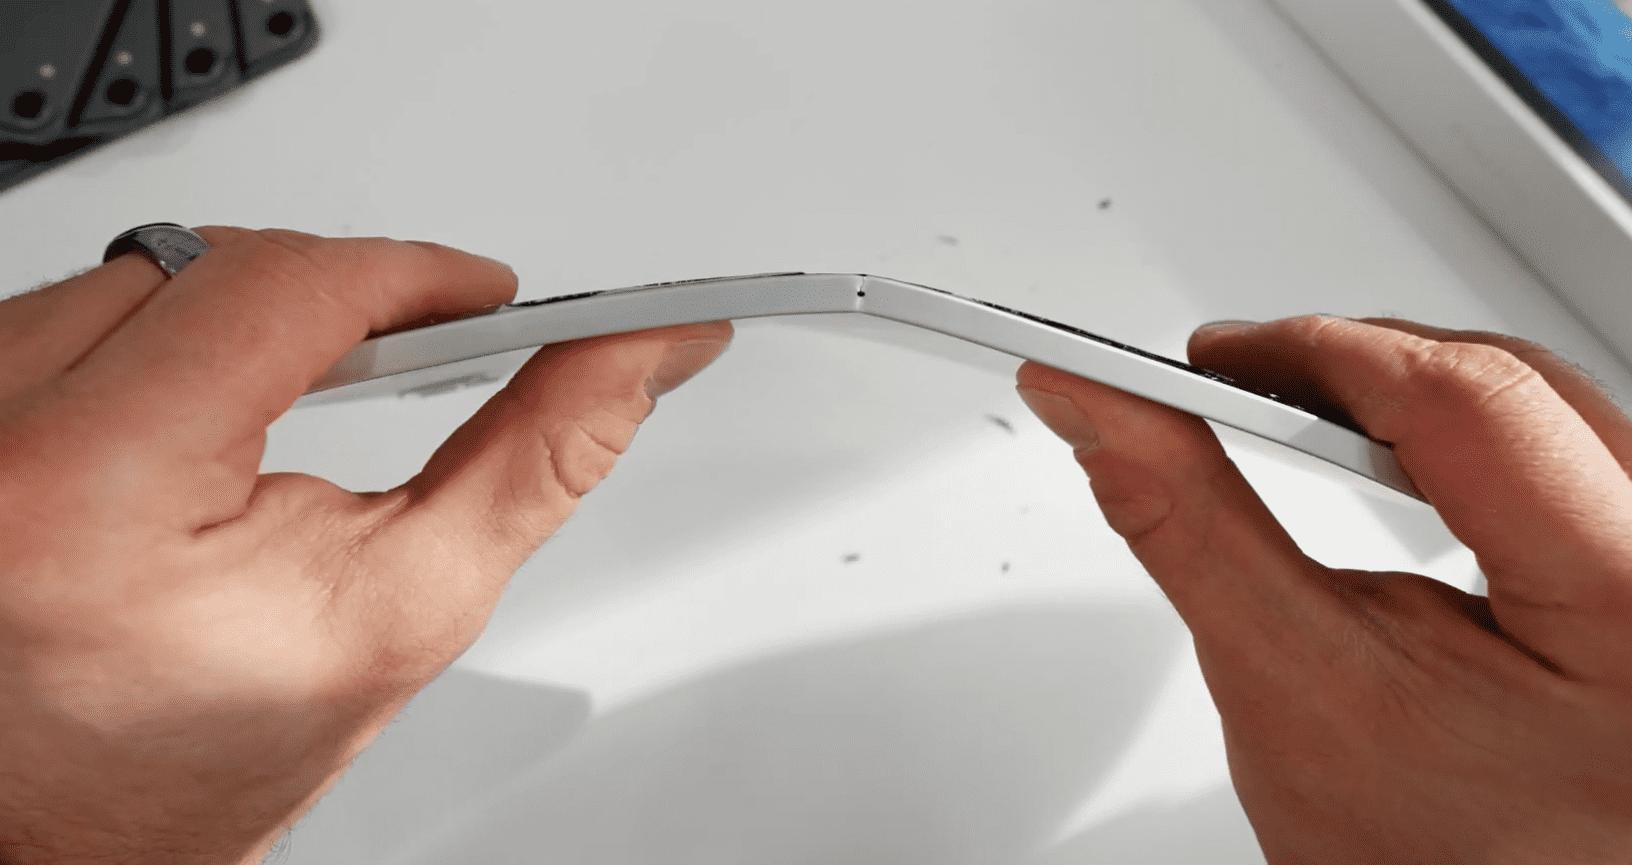 Ipad Pro 2020 Still Bend With Hand Img 4